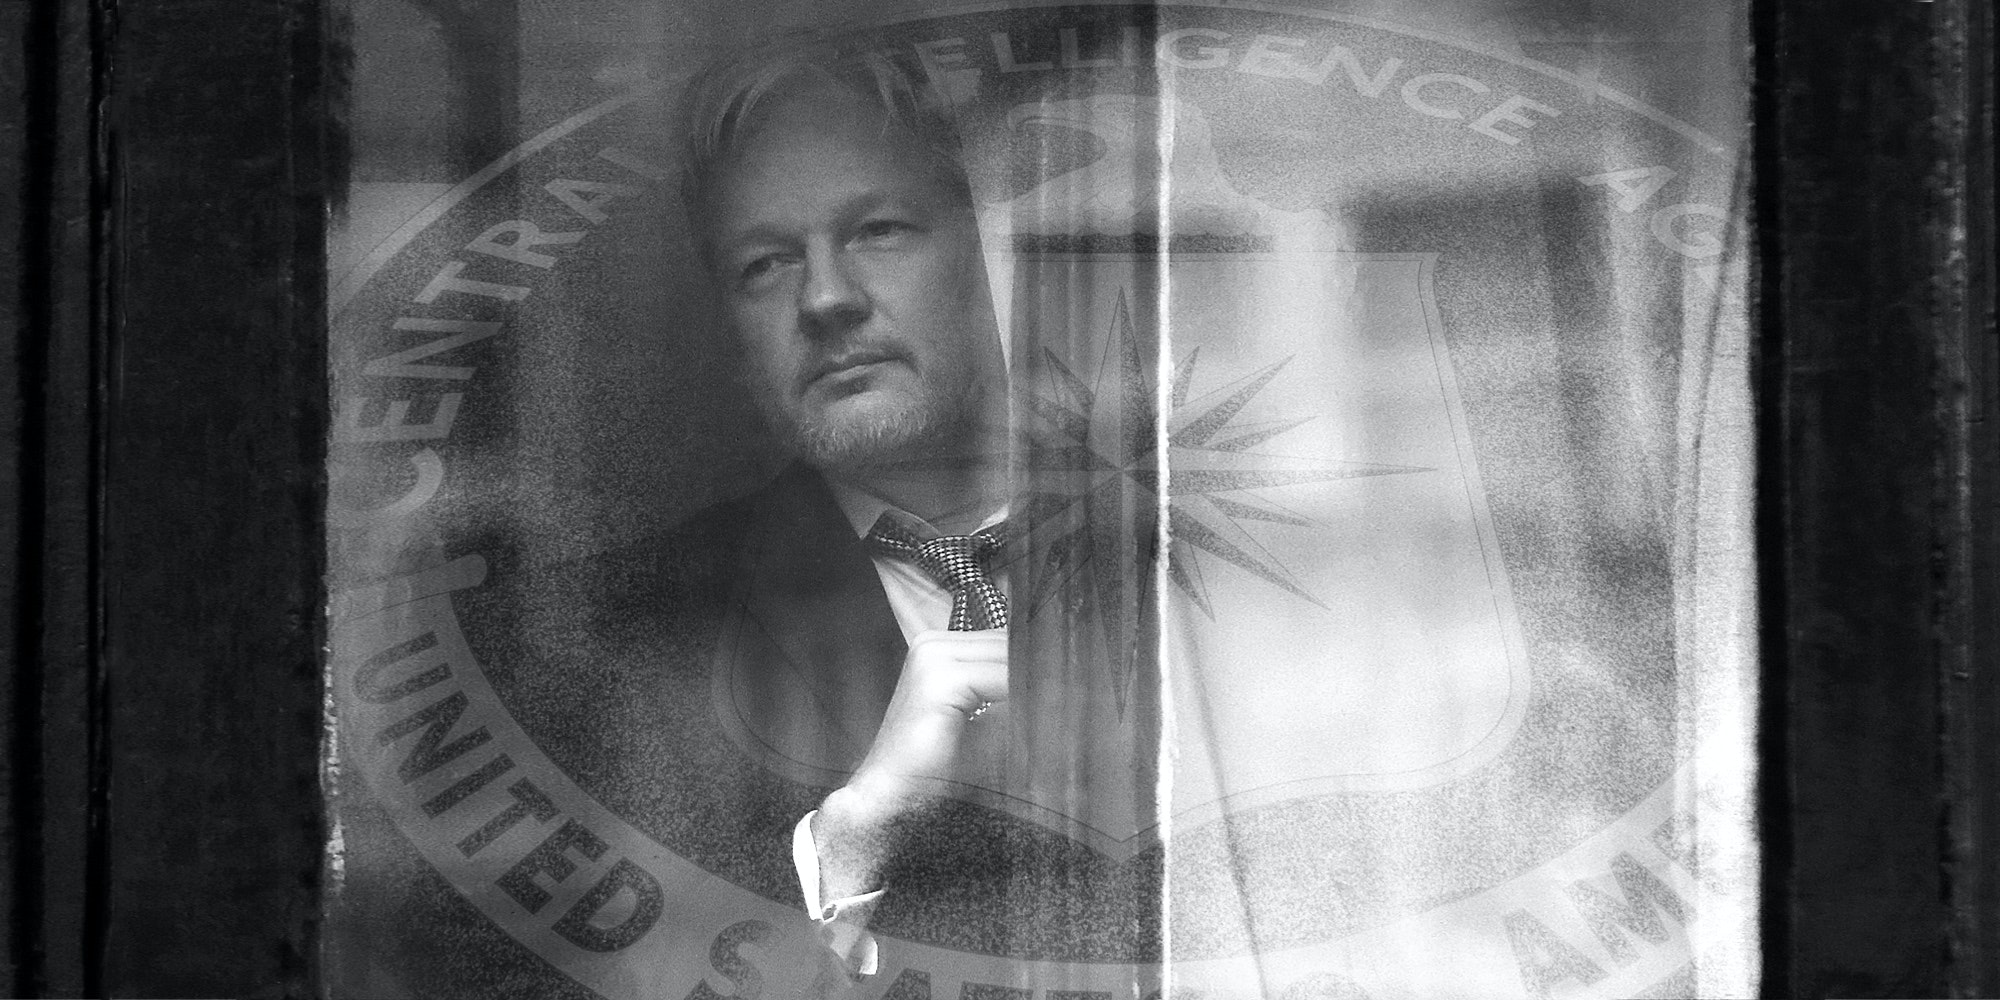 Ja fran assange till londonforhor